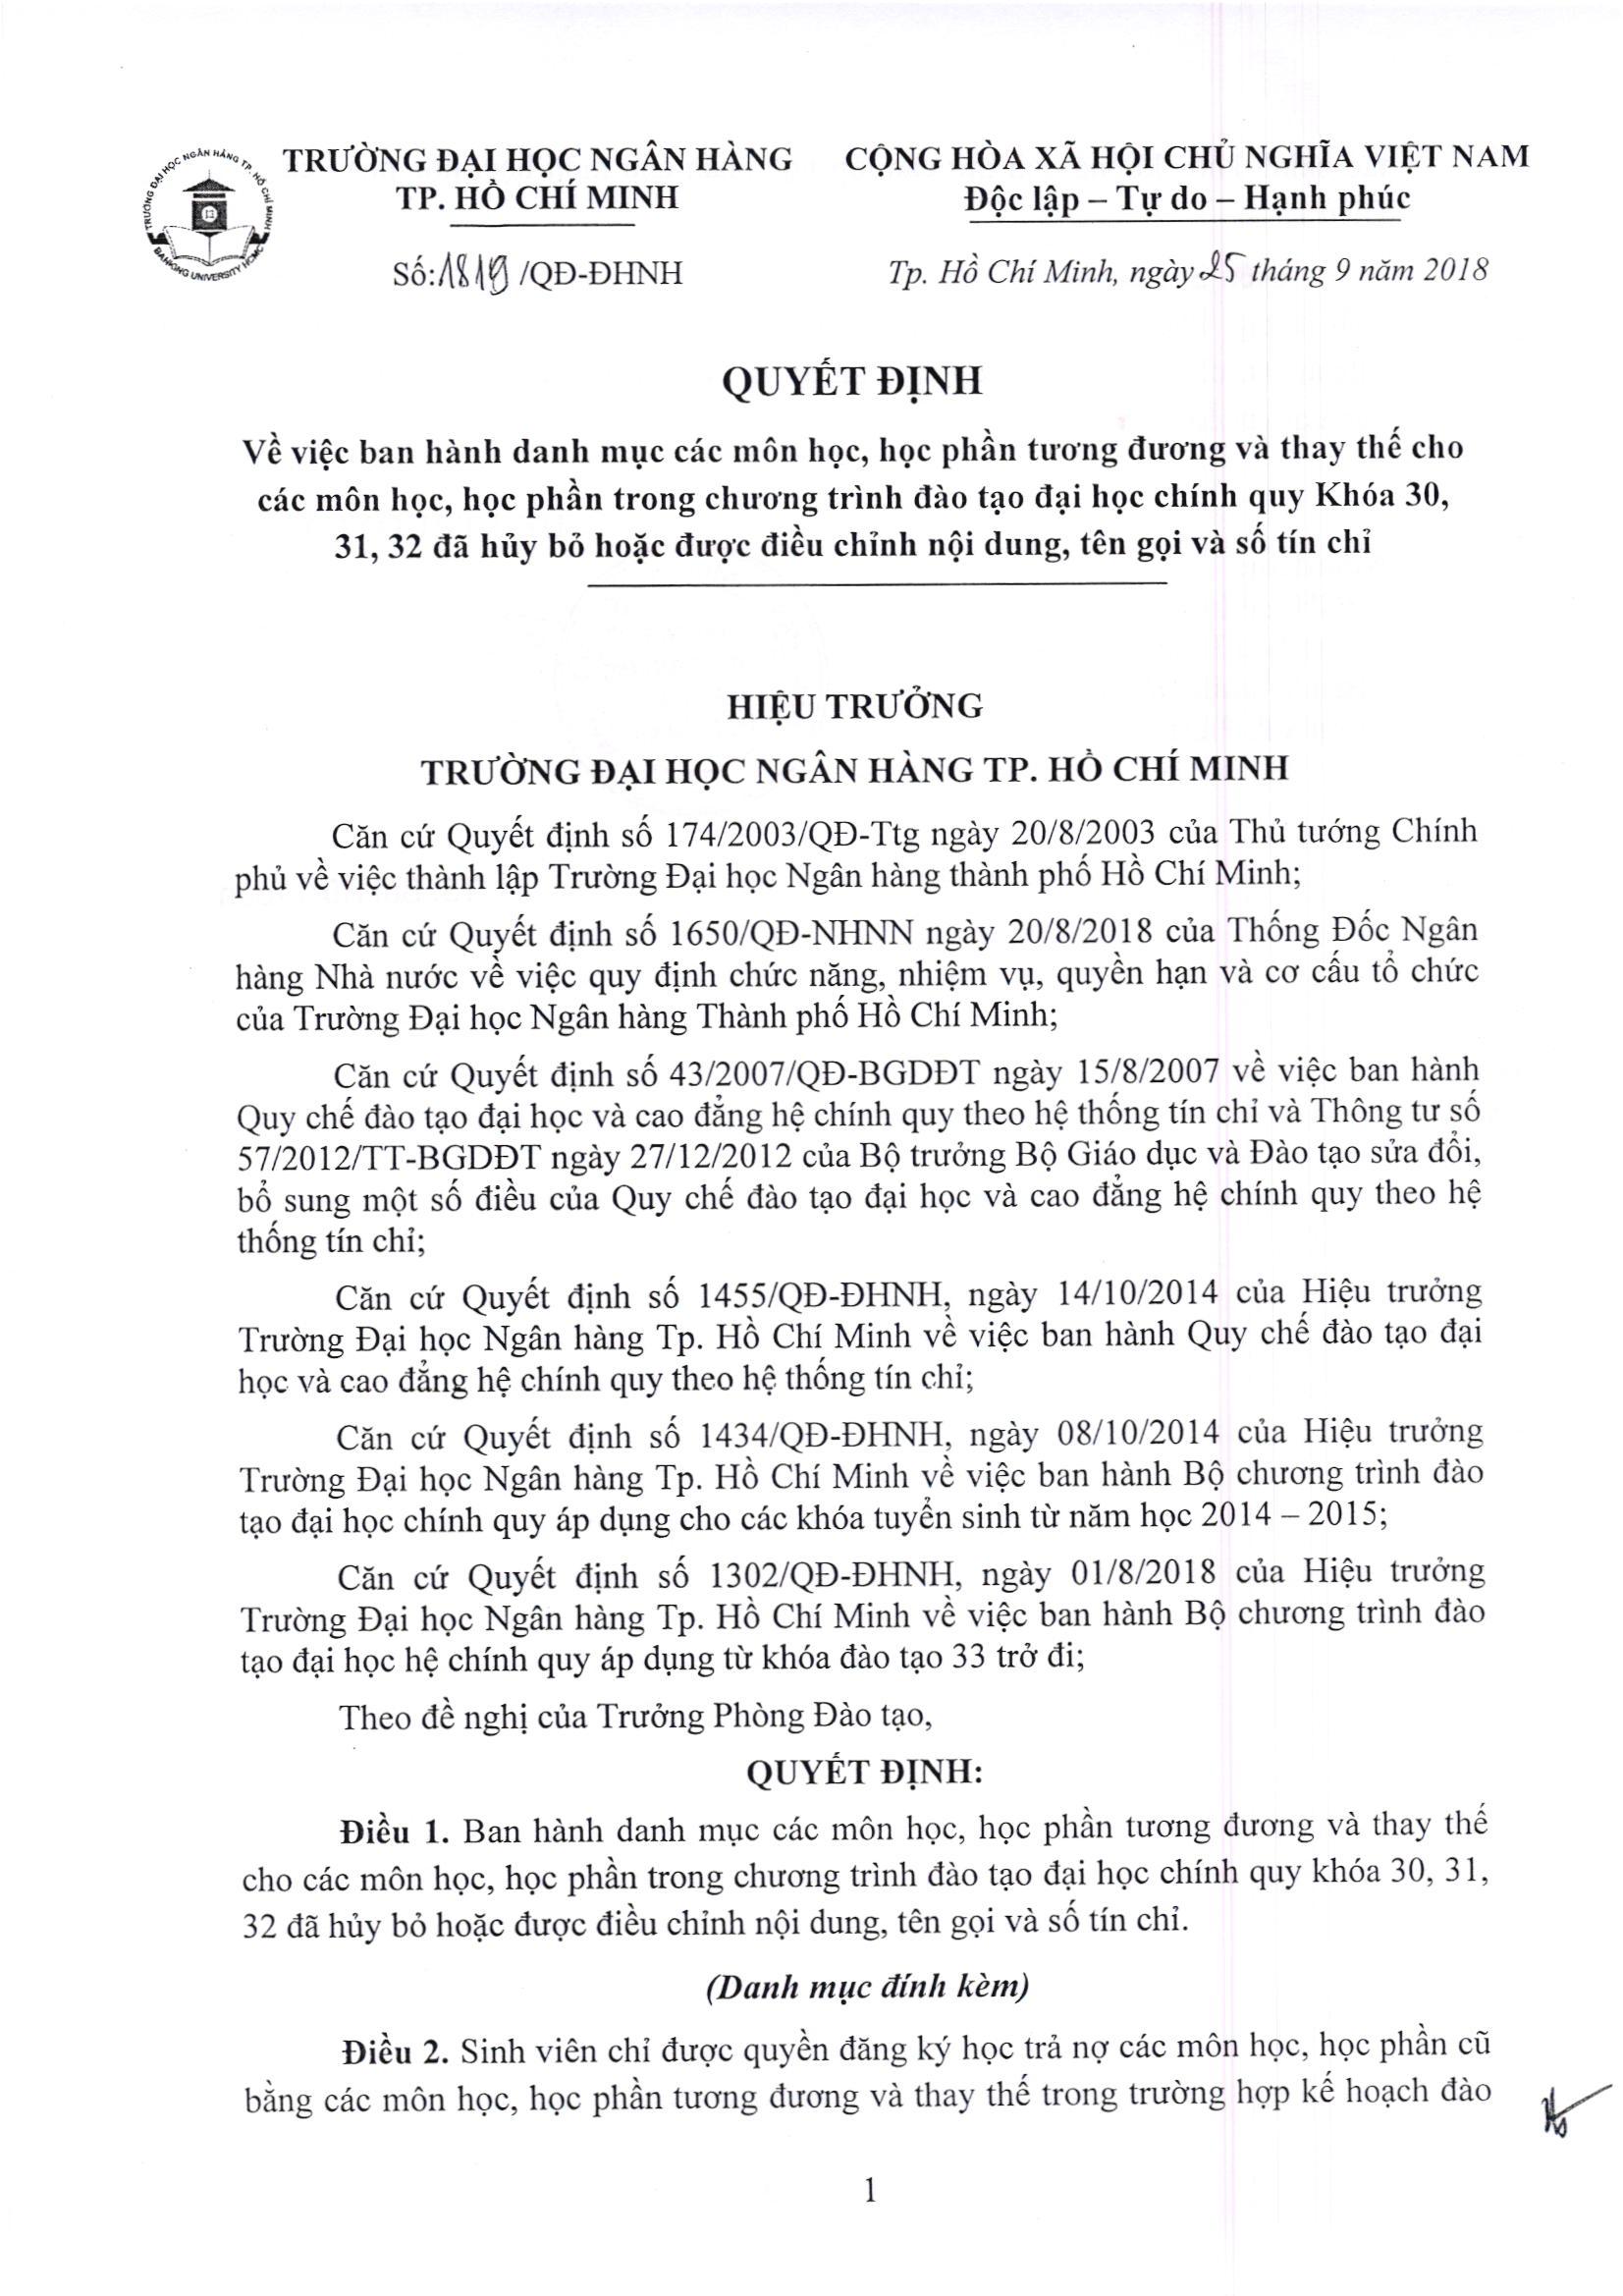 1819.18-Danh muc cac mon hoc-hoc phan tuong duong va thay the mon hoc hoc phan DHCQ K30-31-32_Page_1